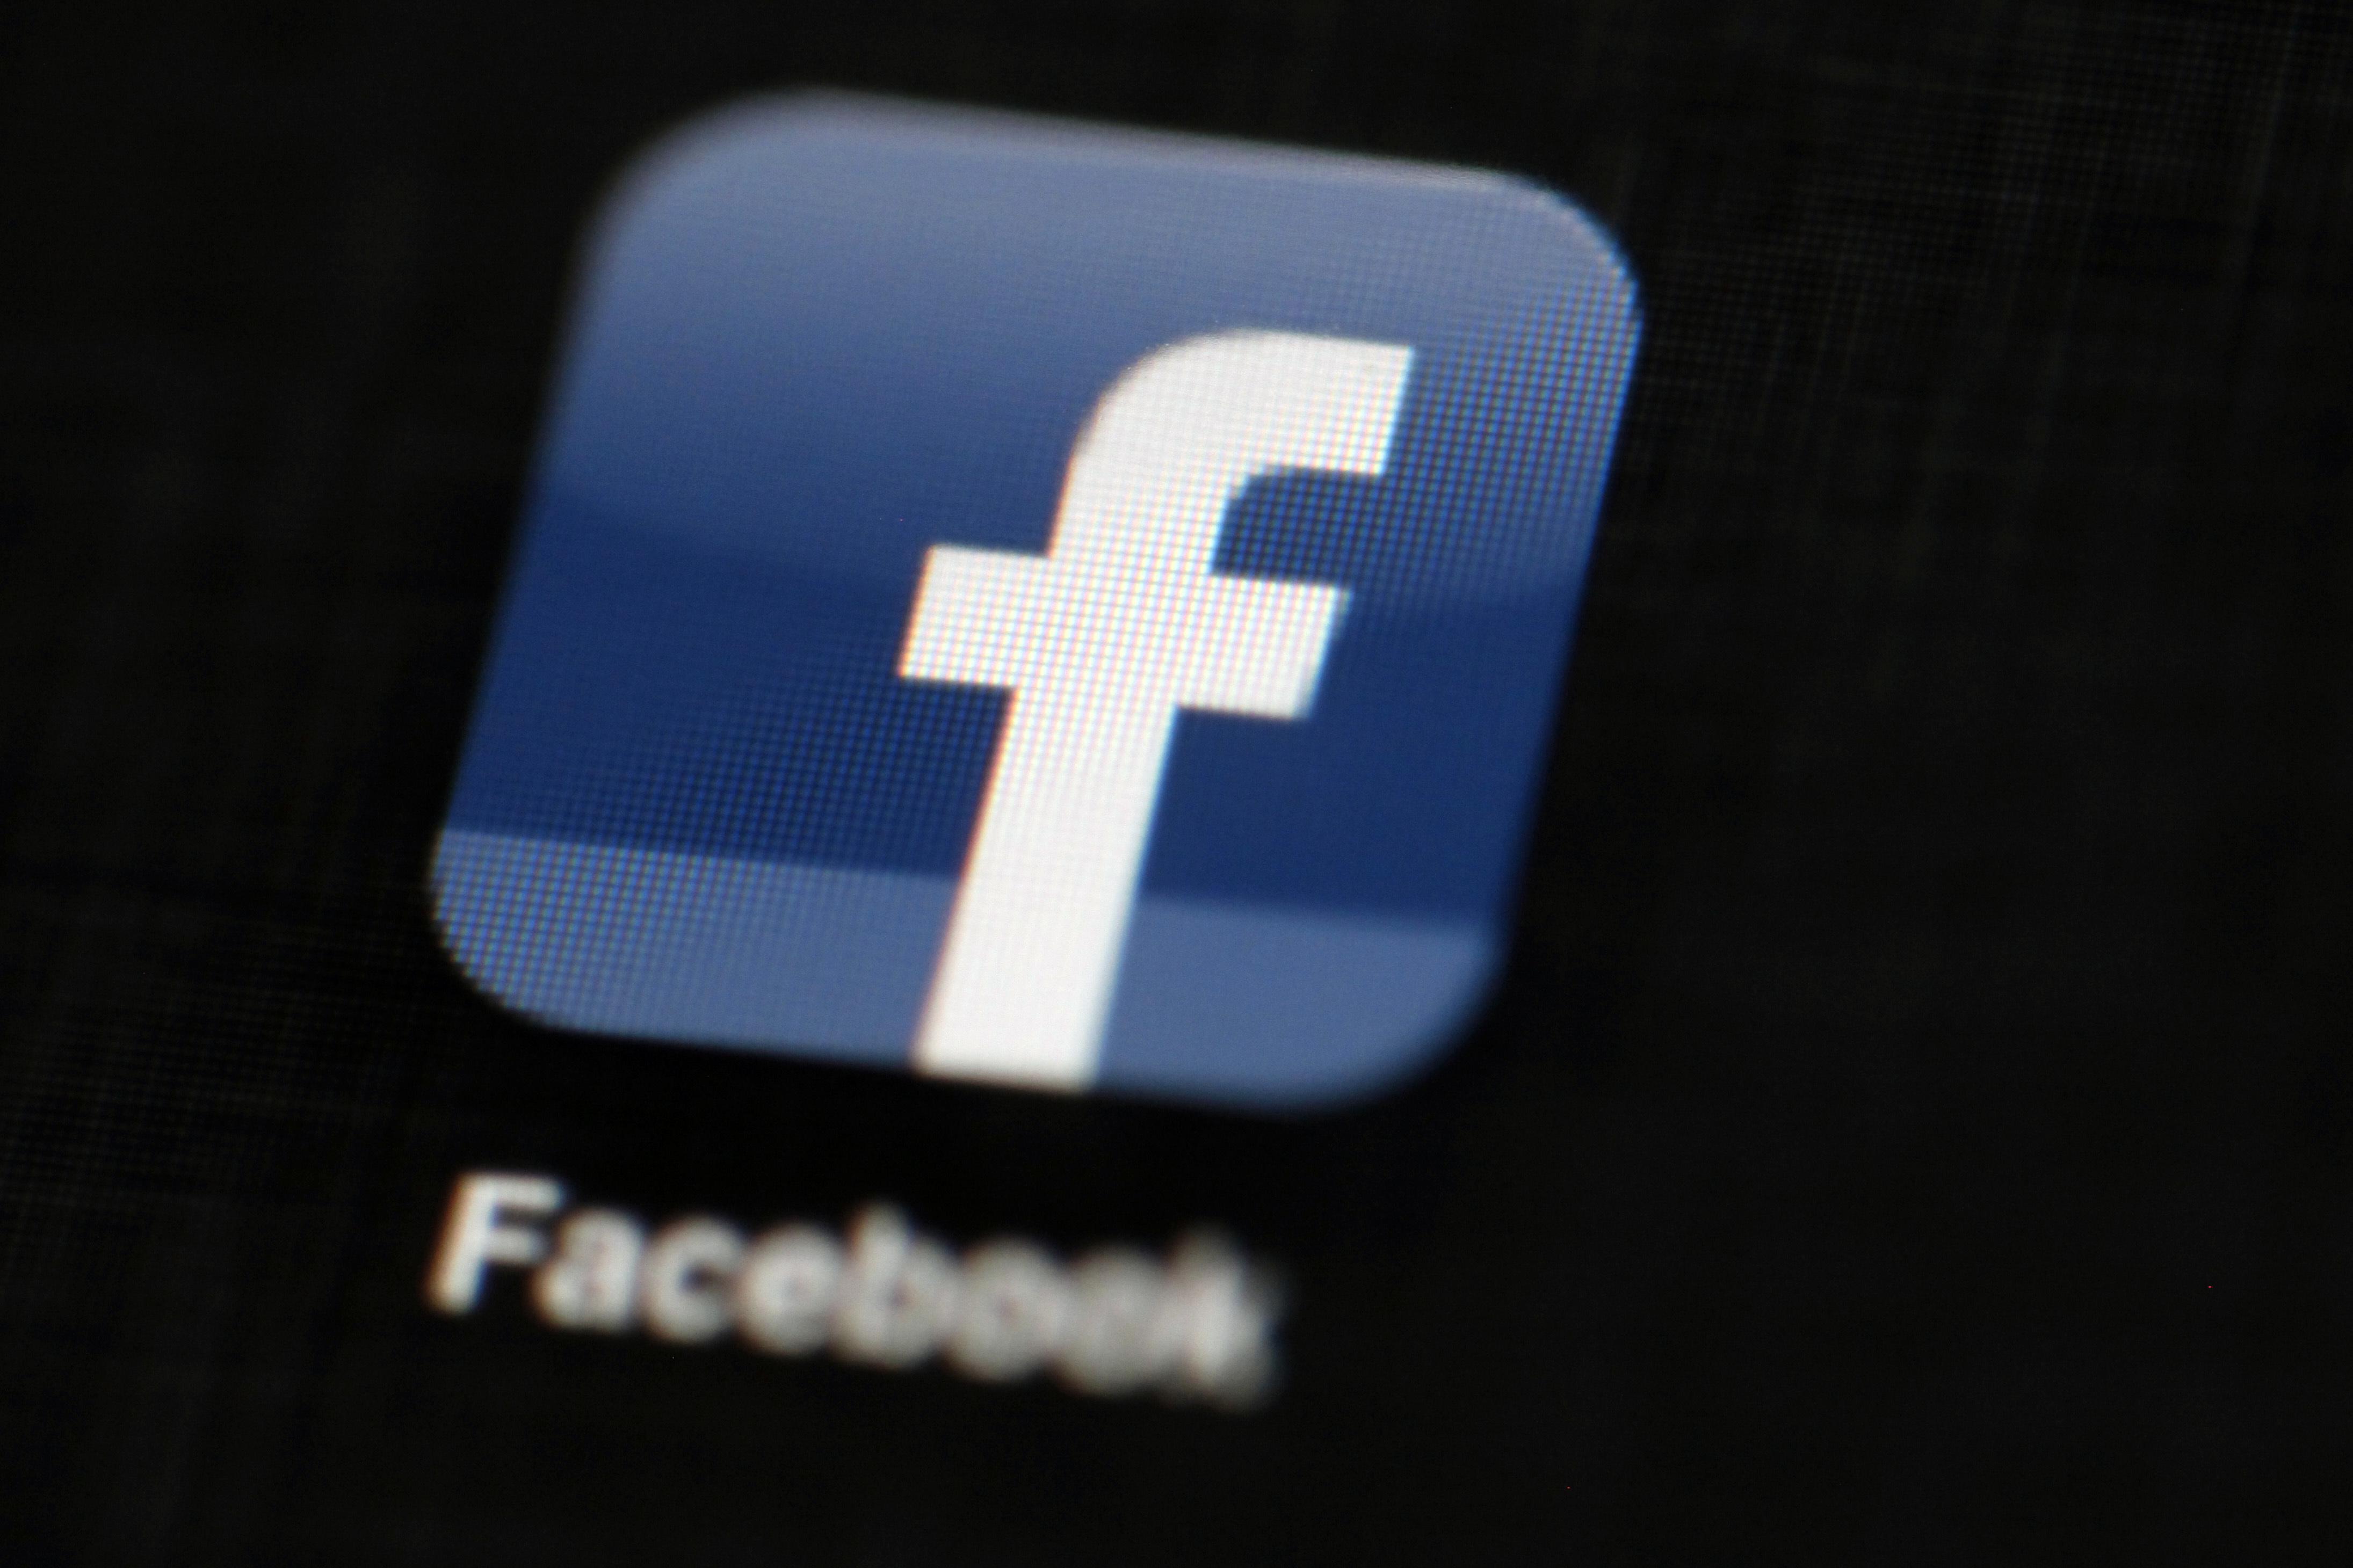 Us regulators target facebook on discriminatory housing ads the matt rourke ap forumfinder Image collections